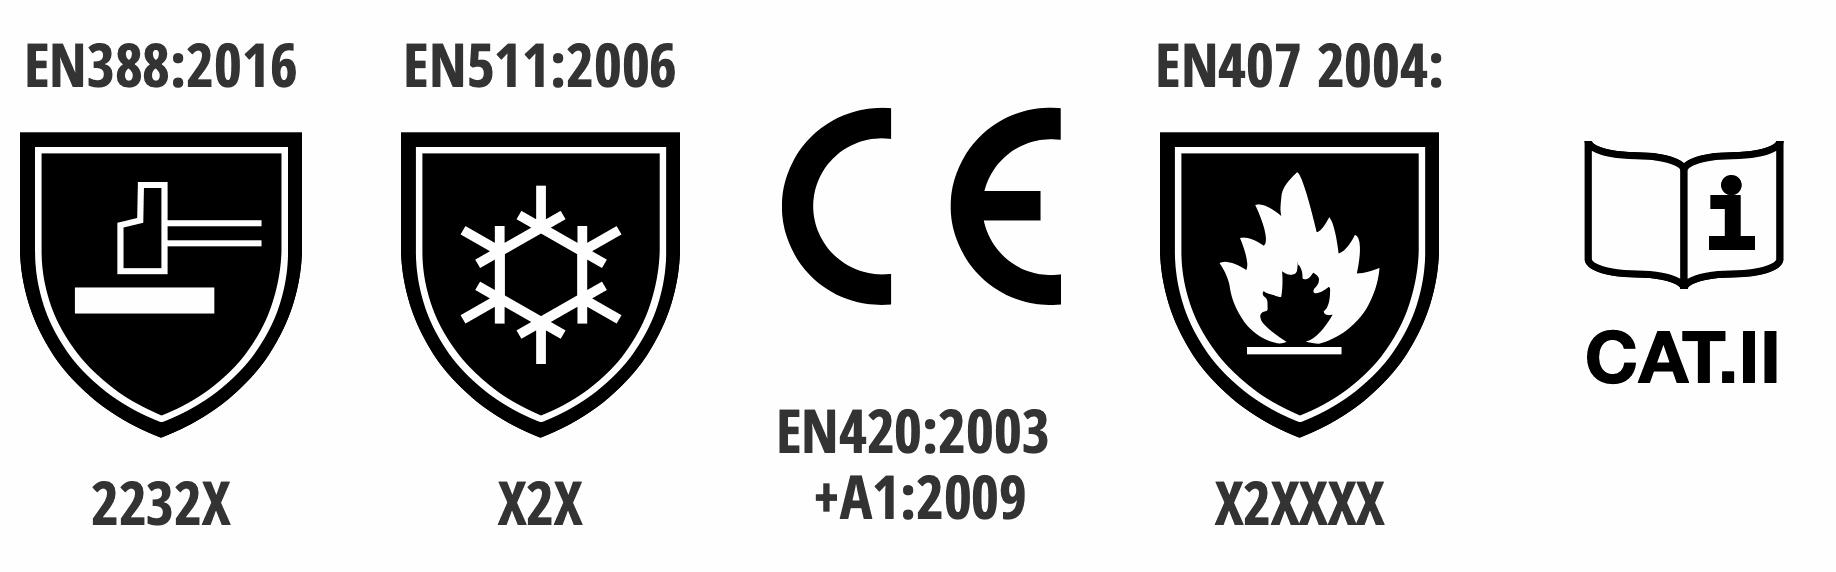 Odoo CMS- Sample image floating